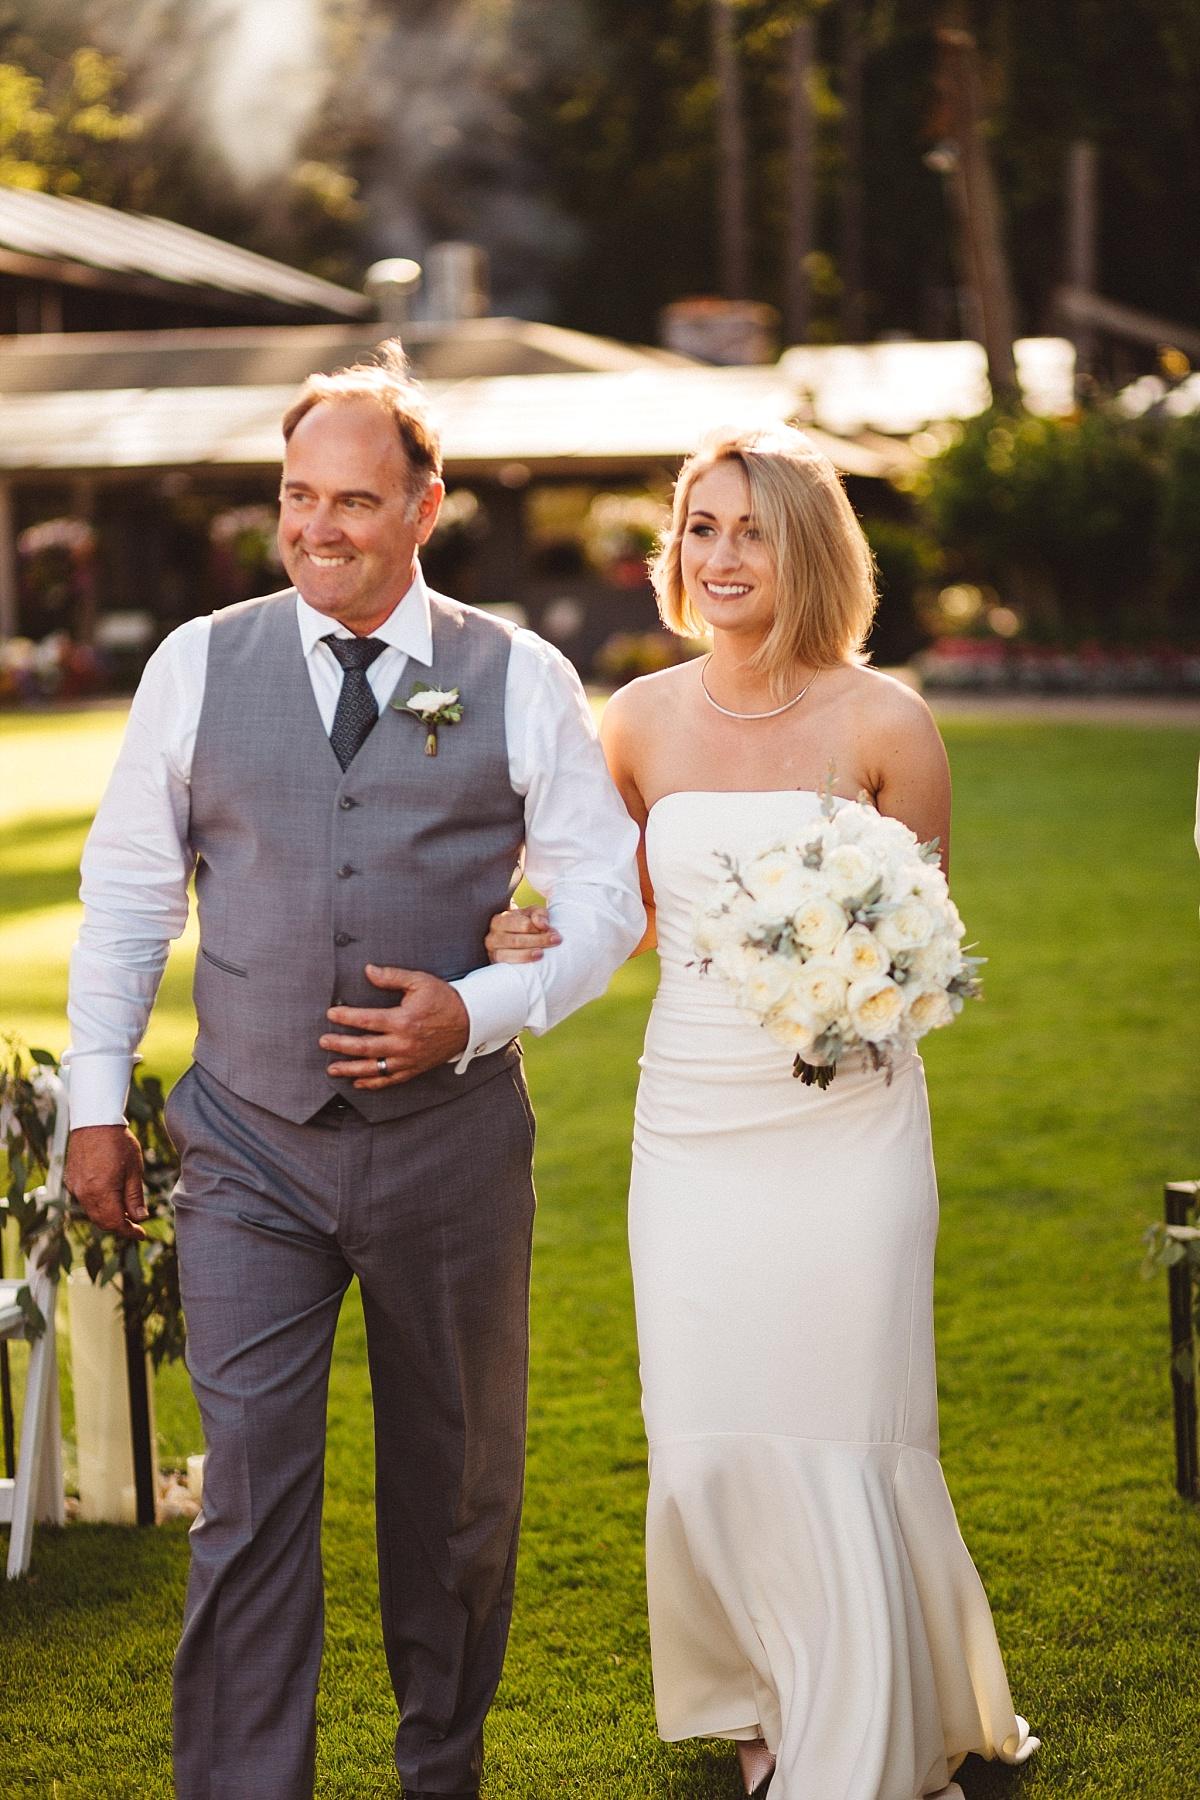 Wiseman-Faces-Photography-Wedding-0046.JPG